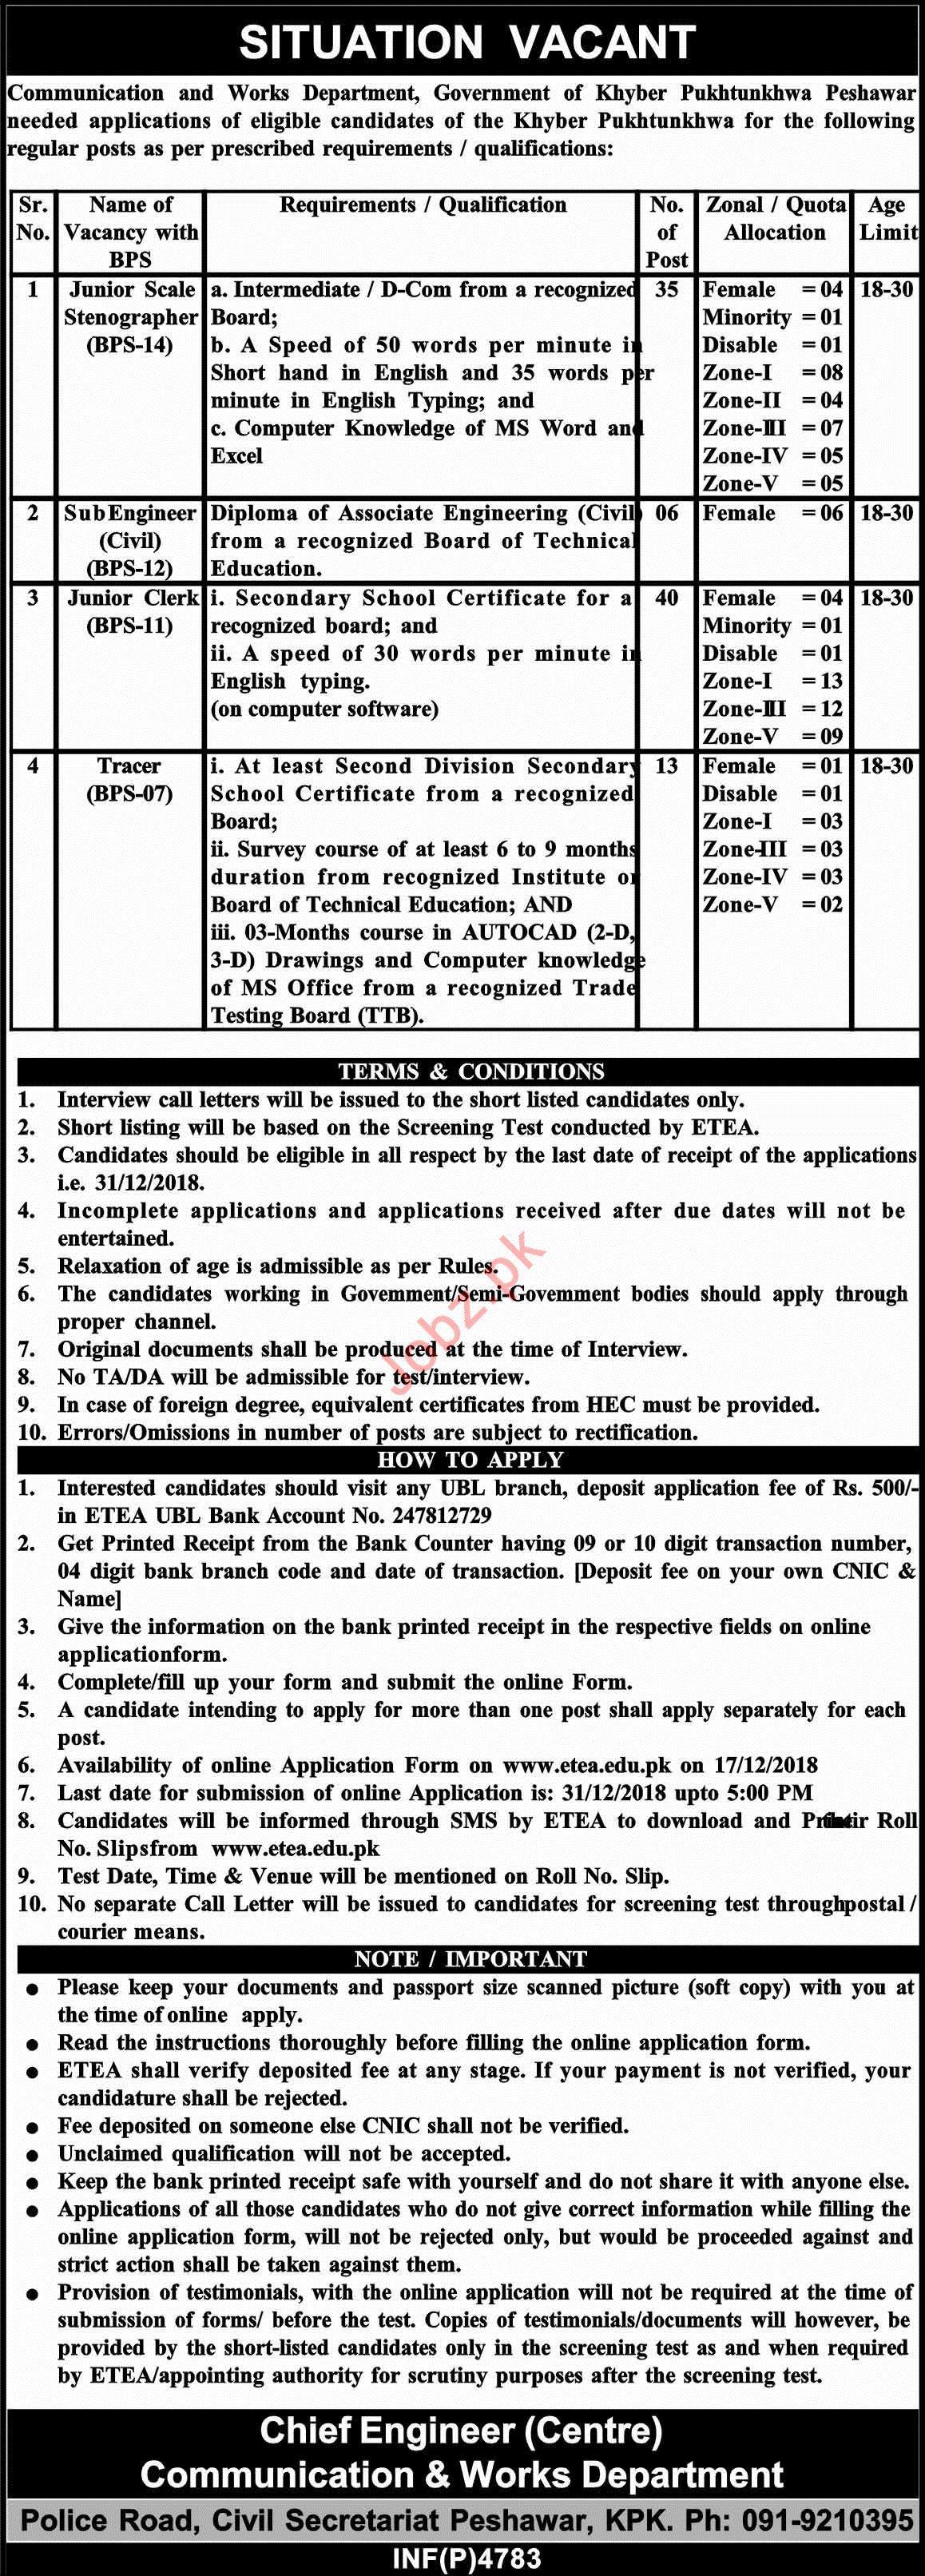 Communication and Works Department Jobs 2019 in Peshawar KPK